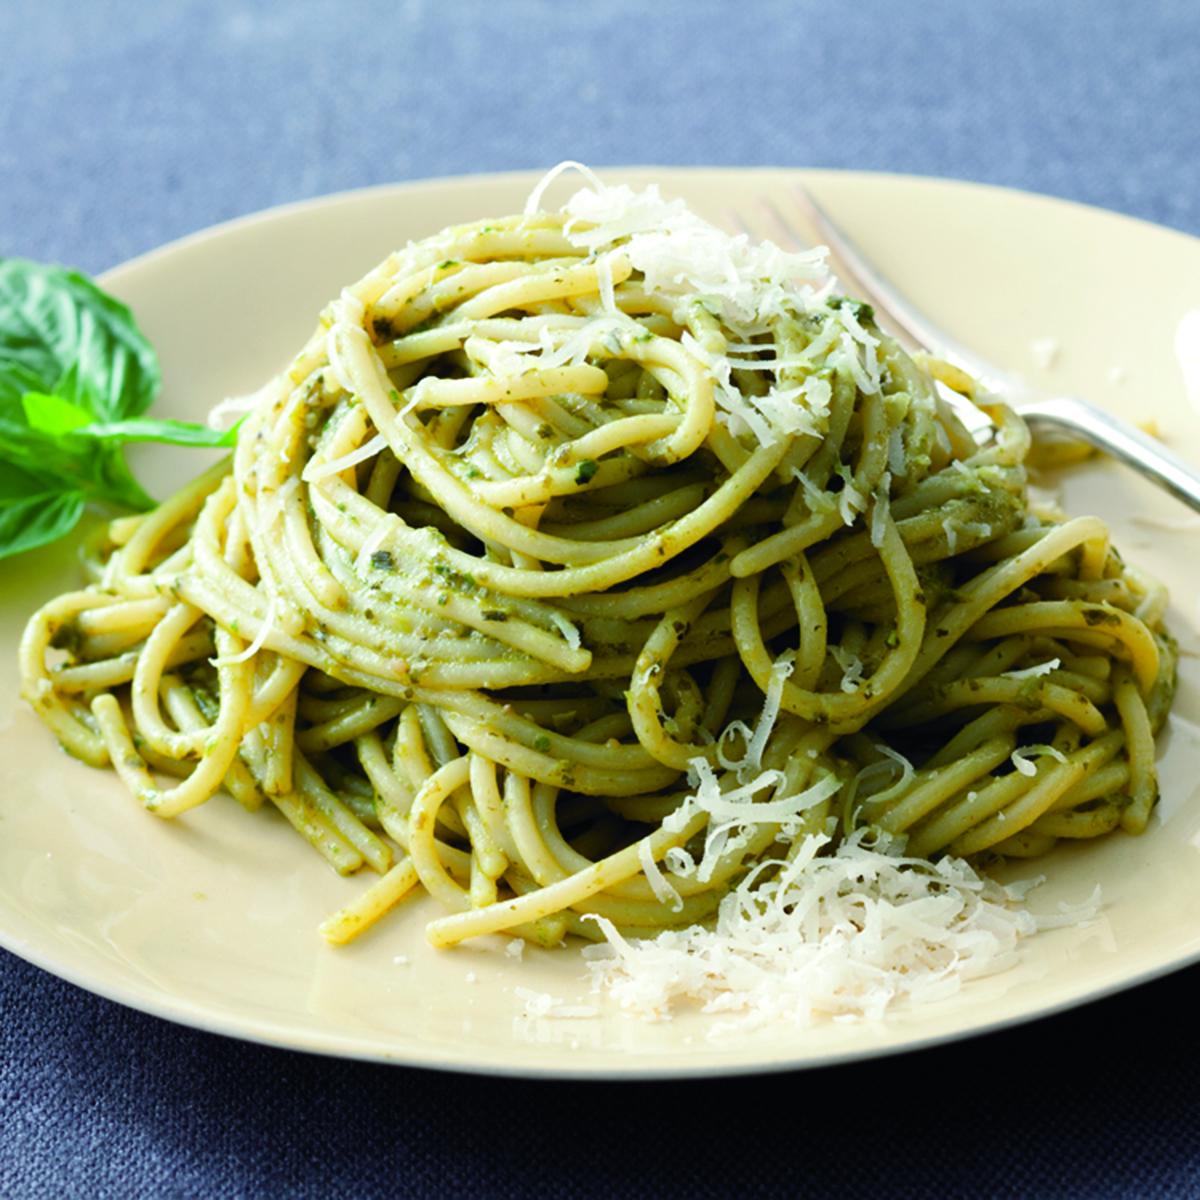 Basil-Infused Pasta